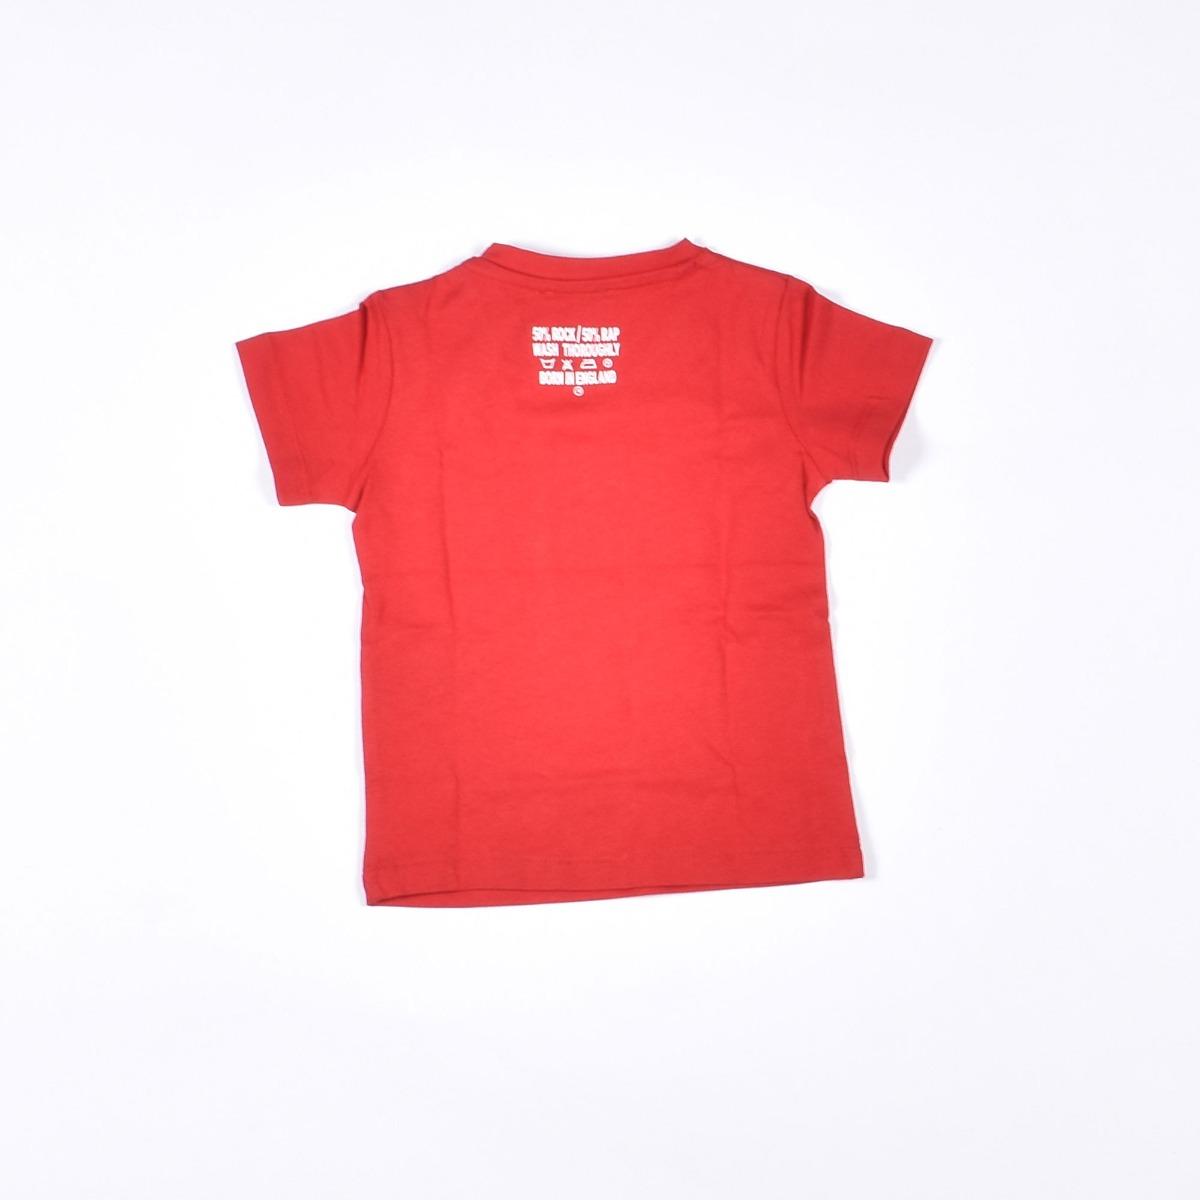 T-shirt inton - Rossa